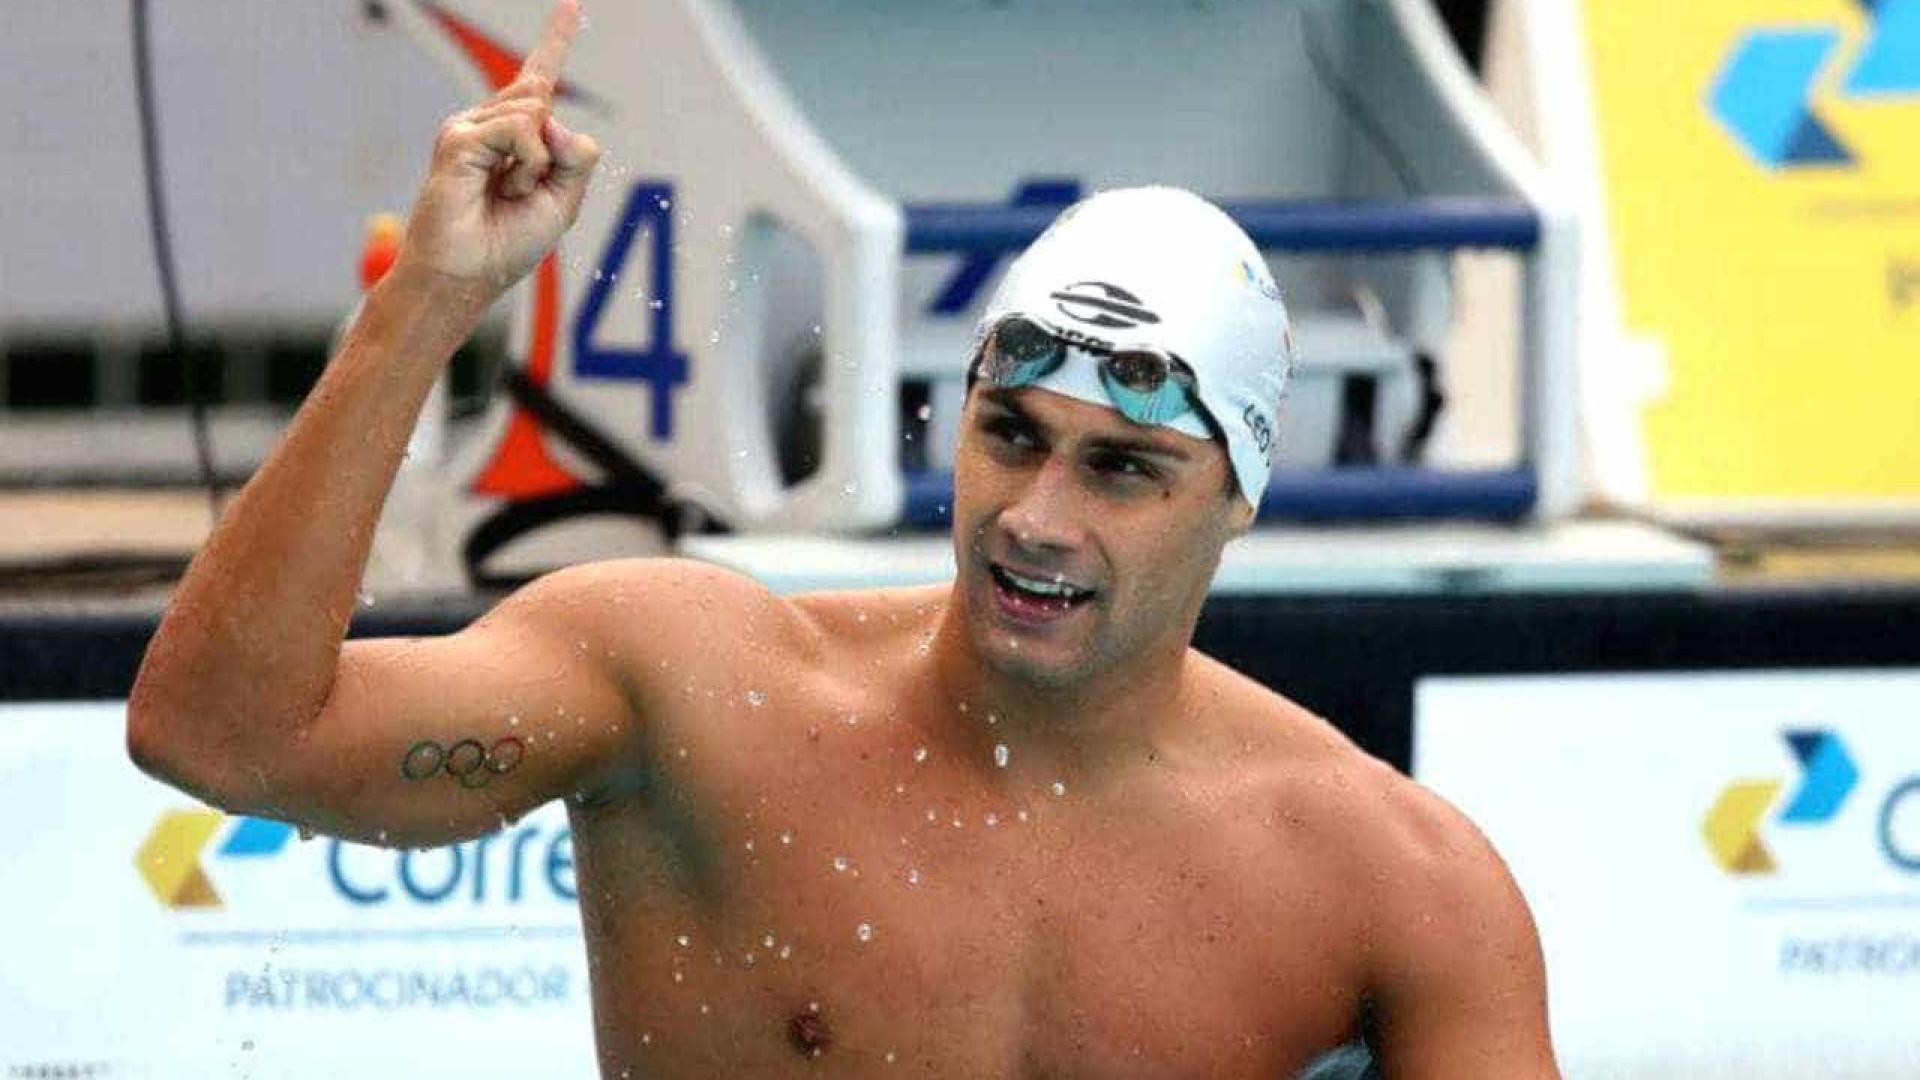 Nadador que teve vírus raro brilha no Troféu Maria Lenk